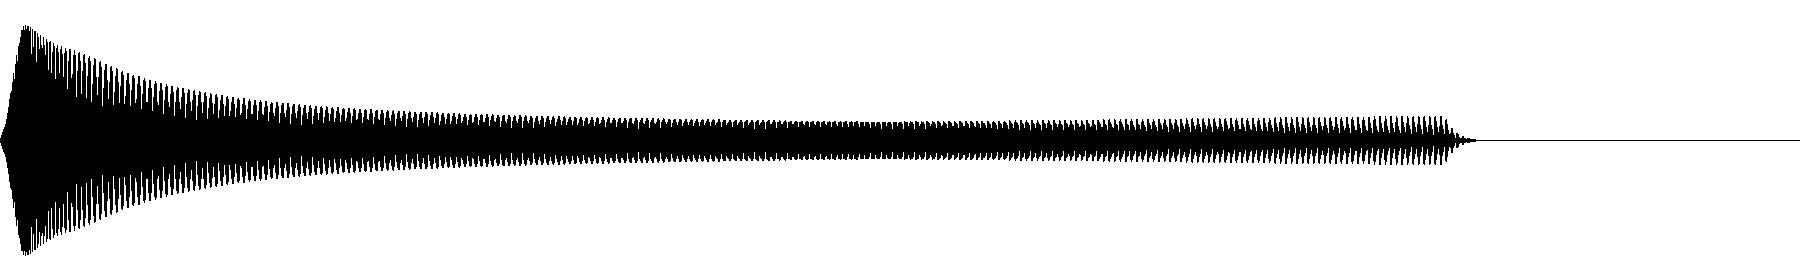 umk c3 synth bass 5